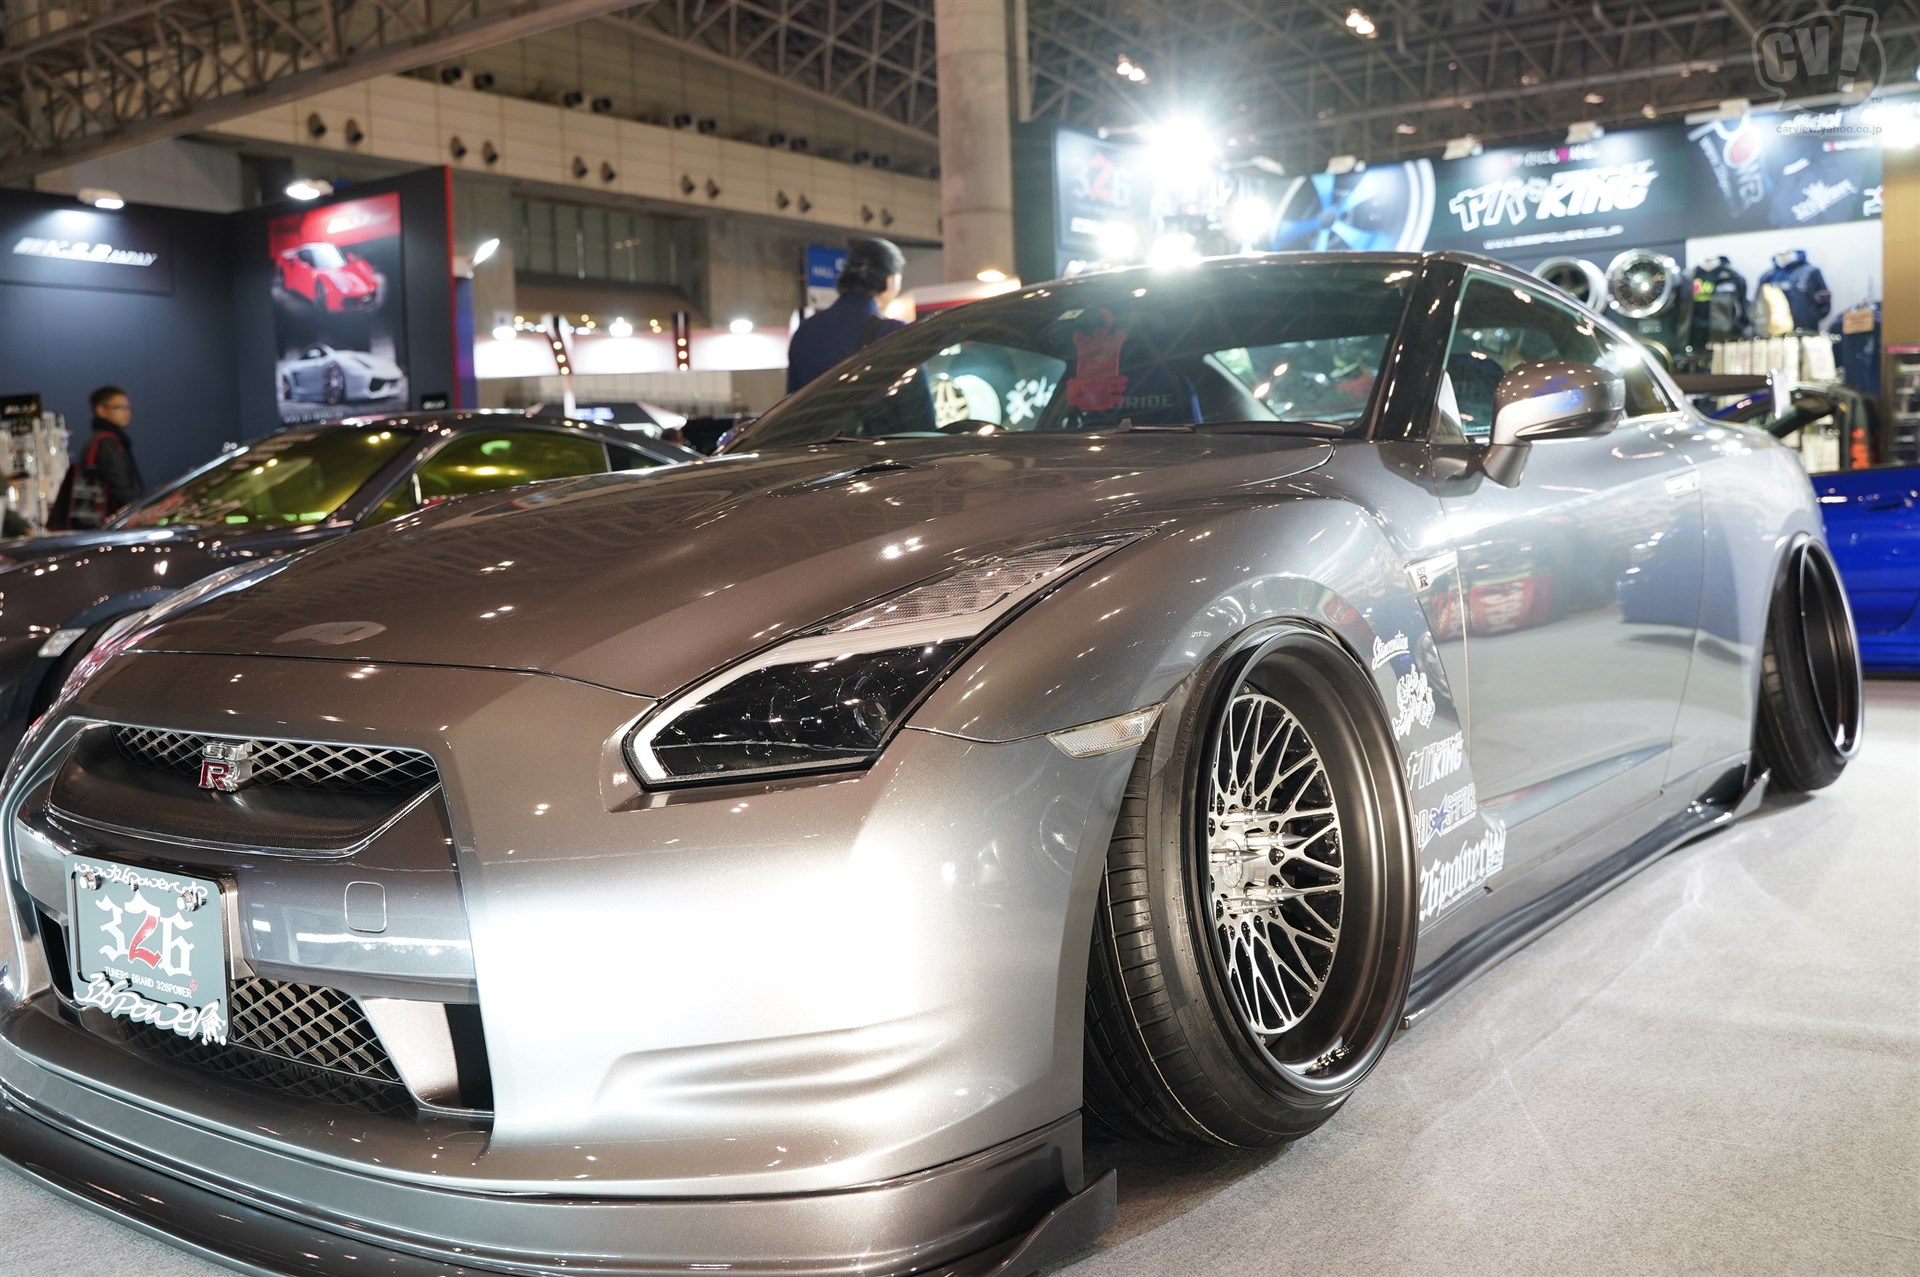 326POWER 3D STAR NISSAN R35 GT-R